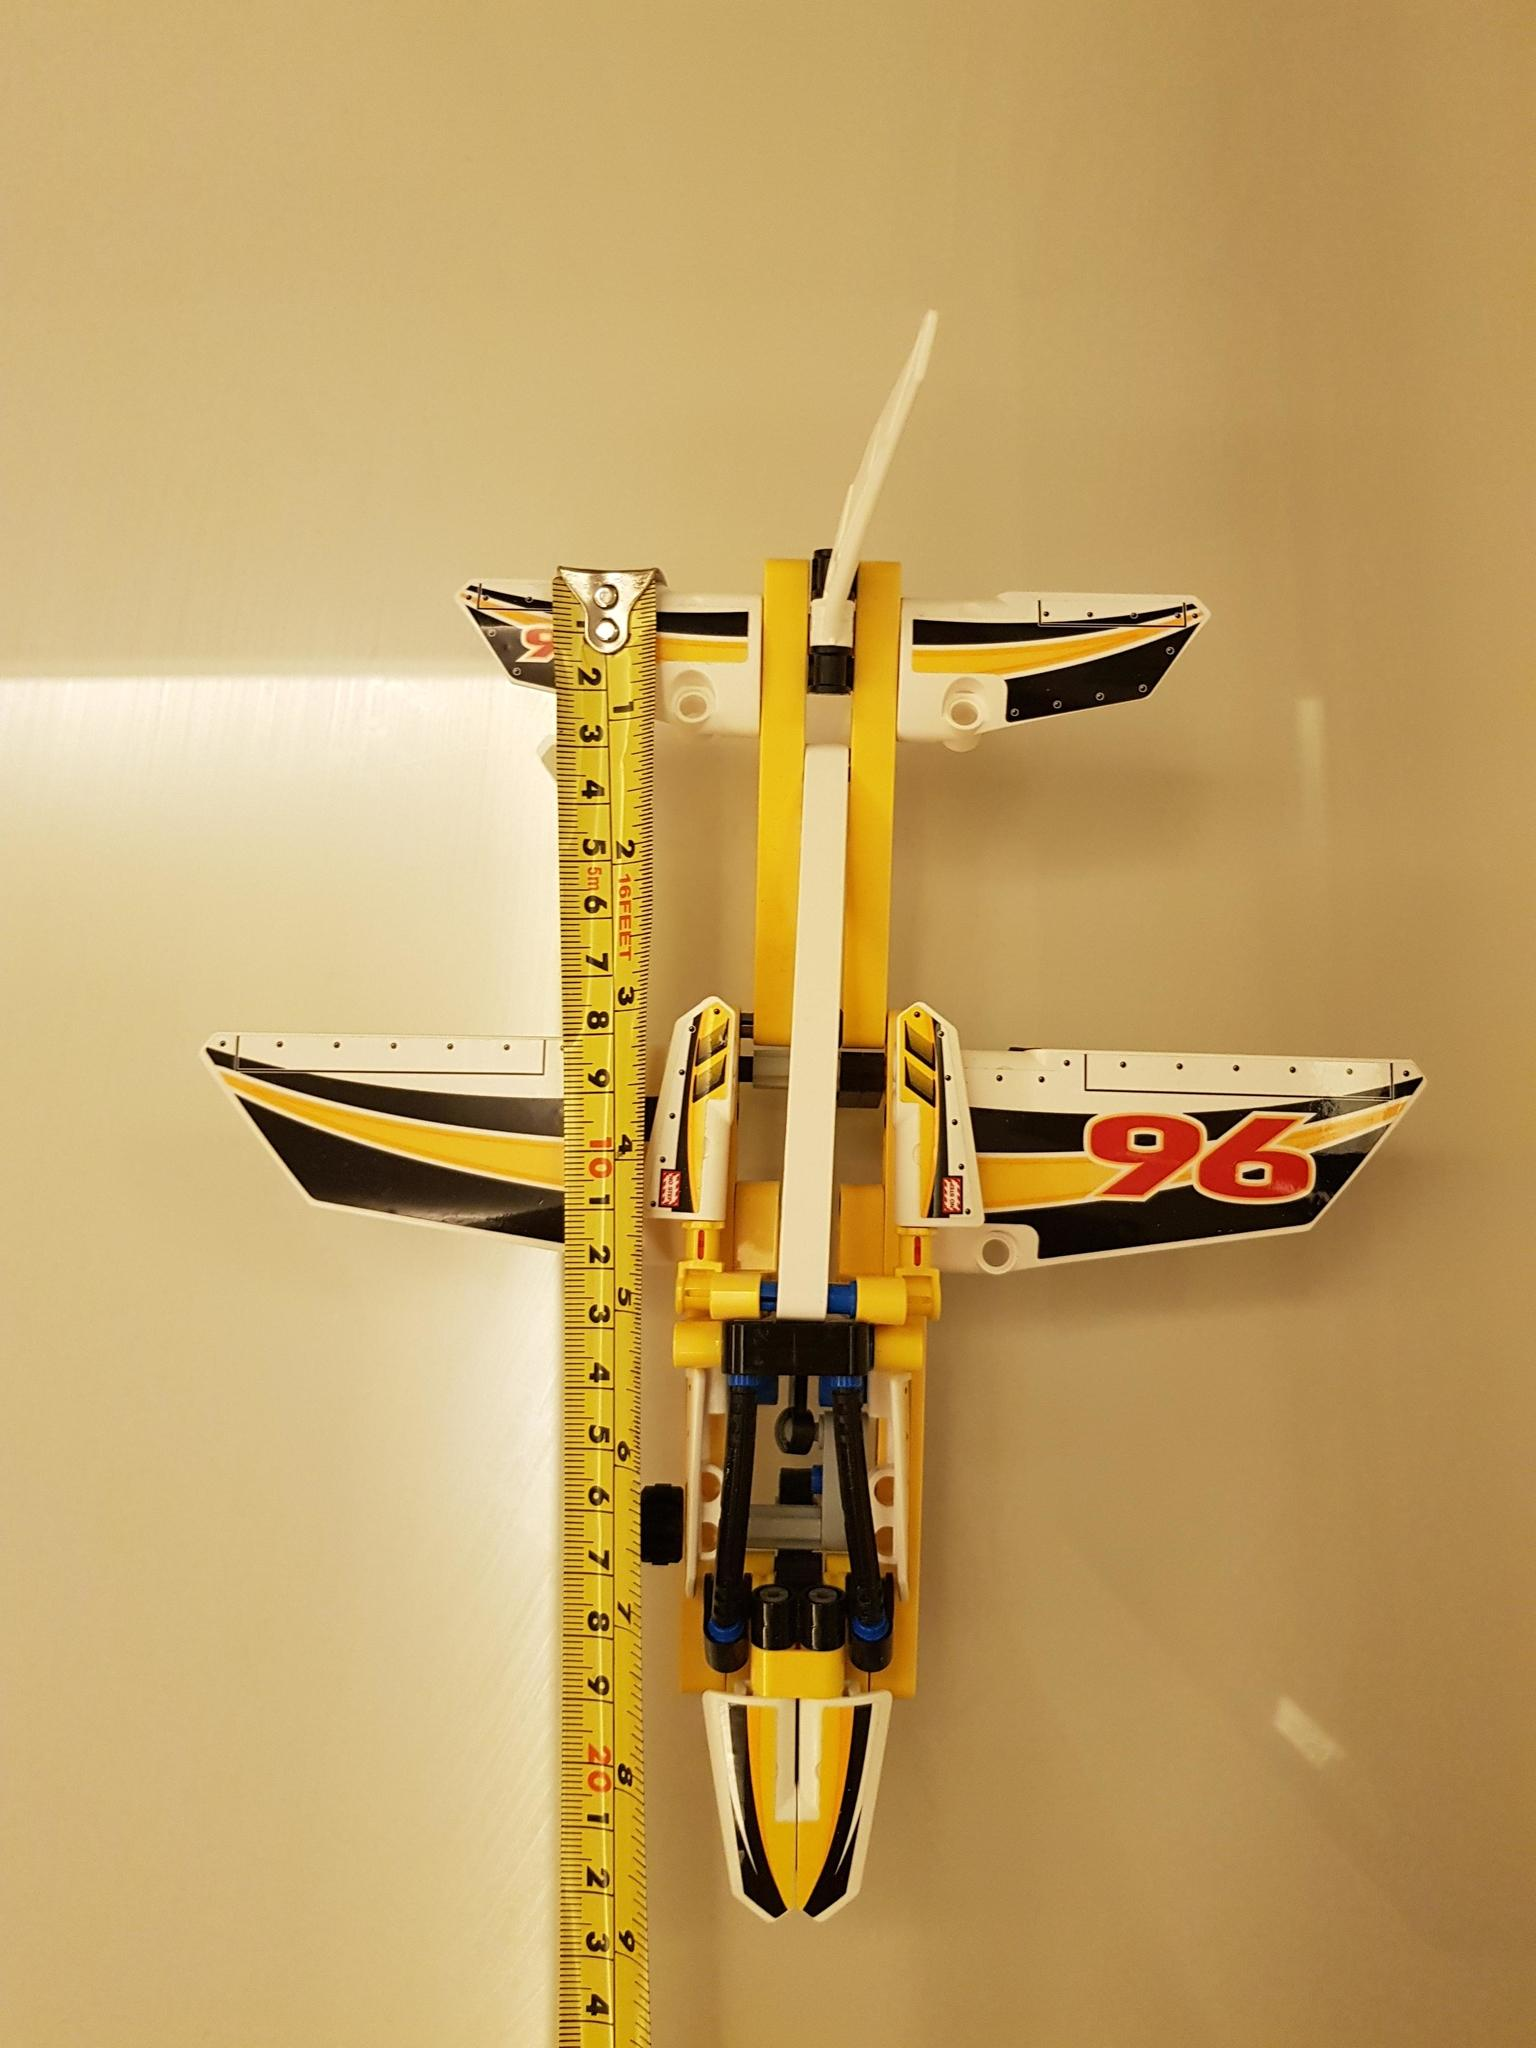 LEGO Technic Display Team Jet 42044 (Assembled)